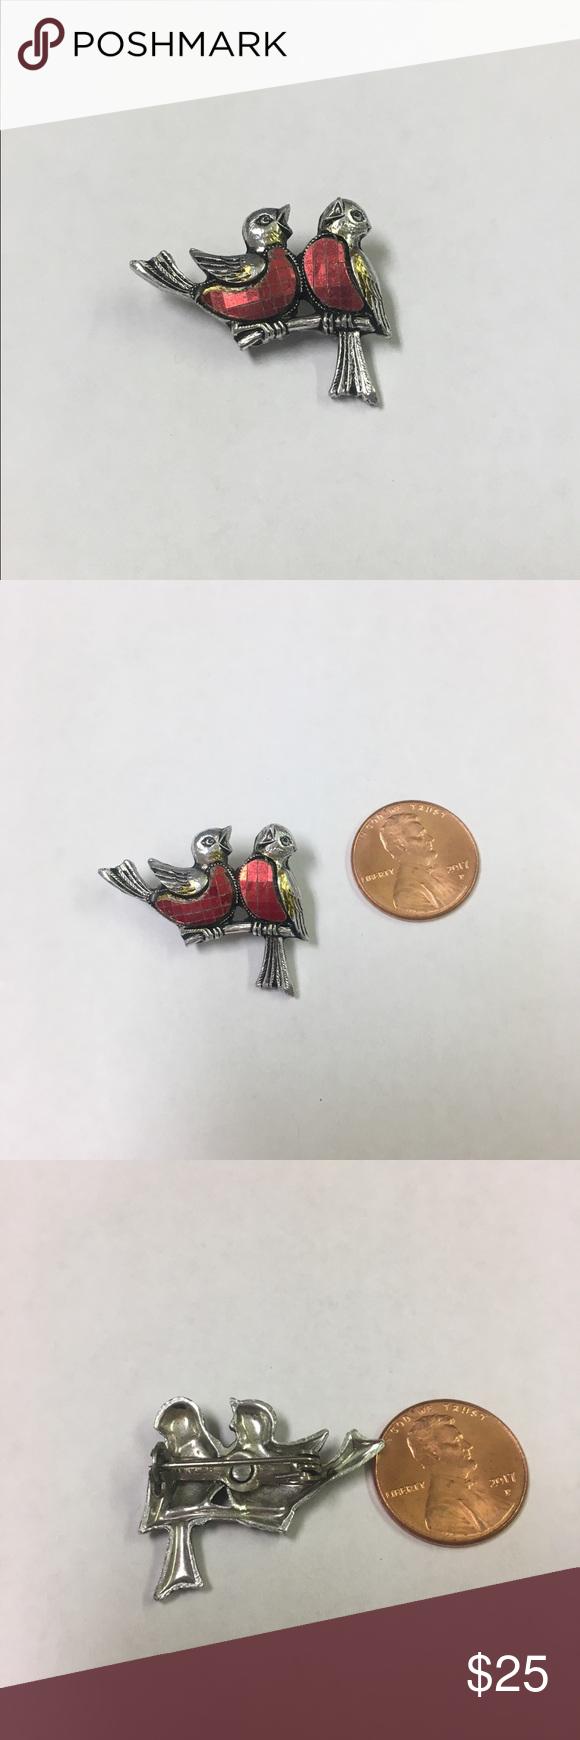 Vintage small red birds made in Germany brooch Light